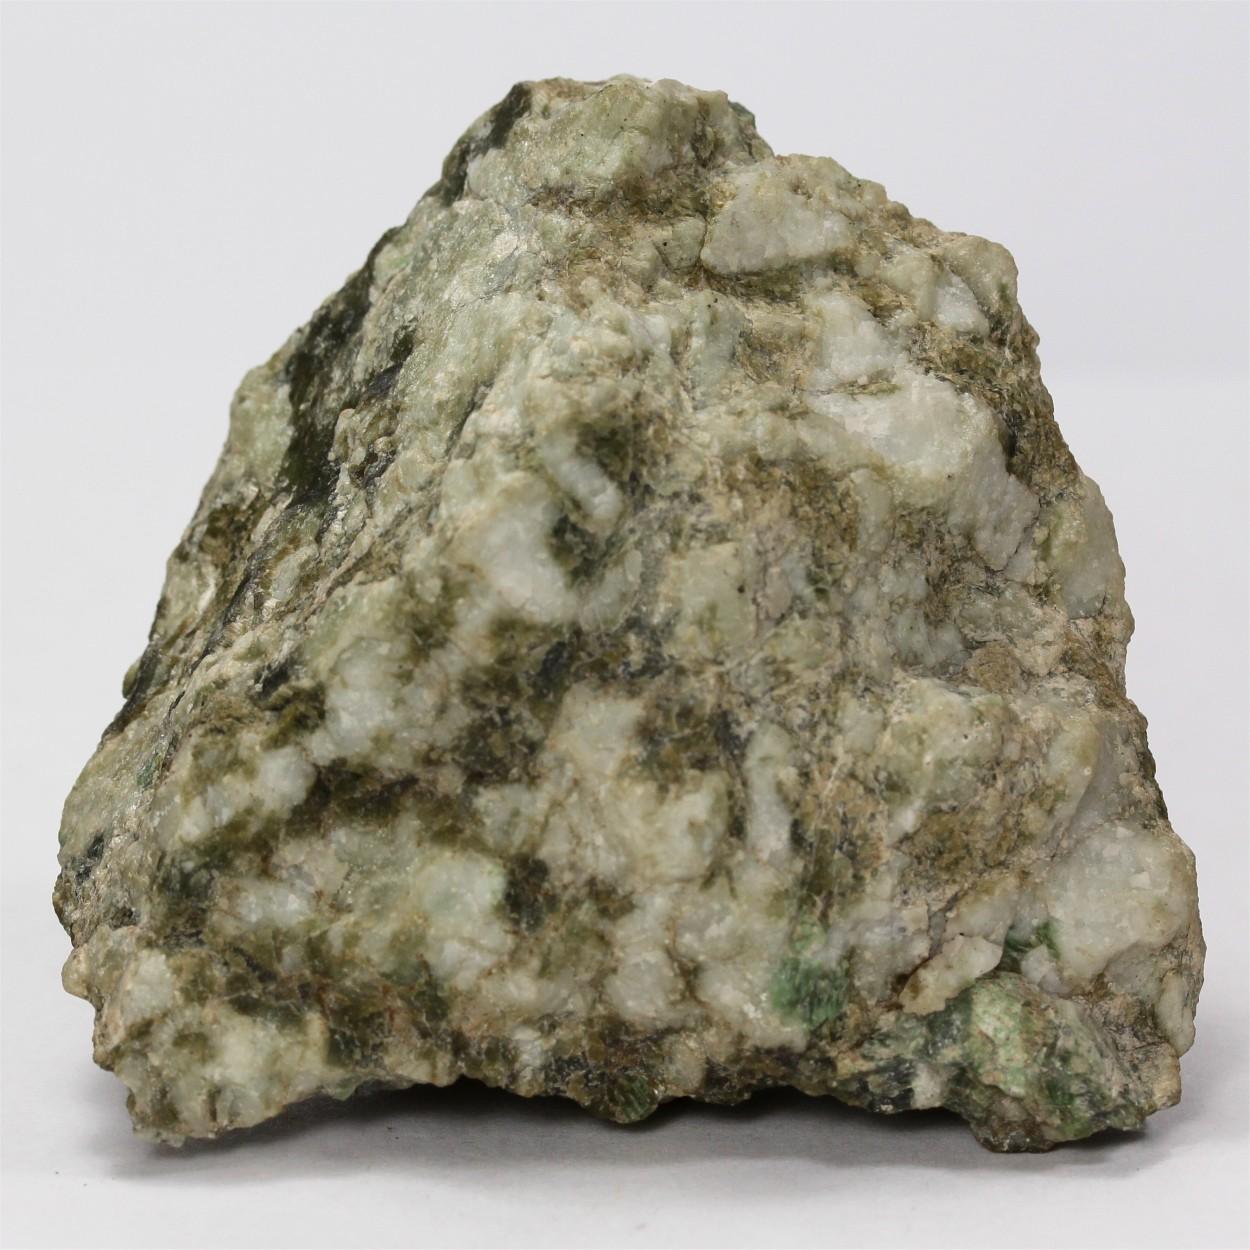 Clinochlore Var Pennine Psm Pyroxene Group